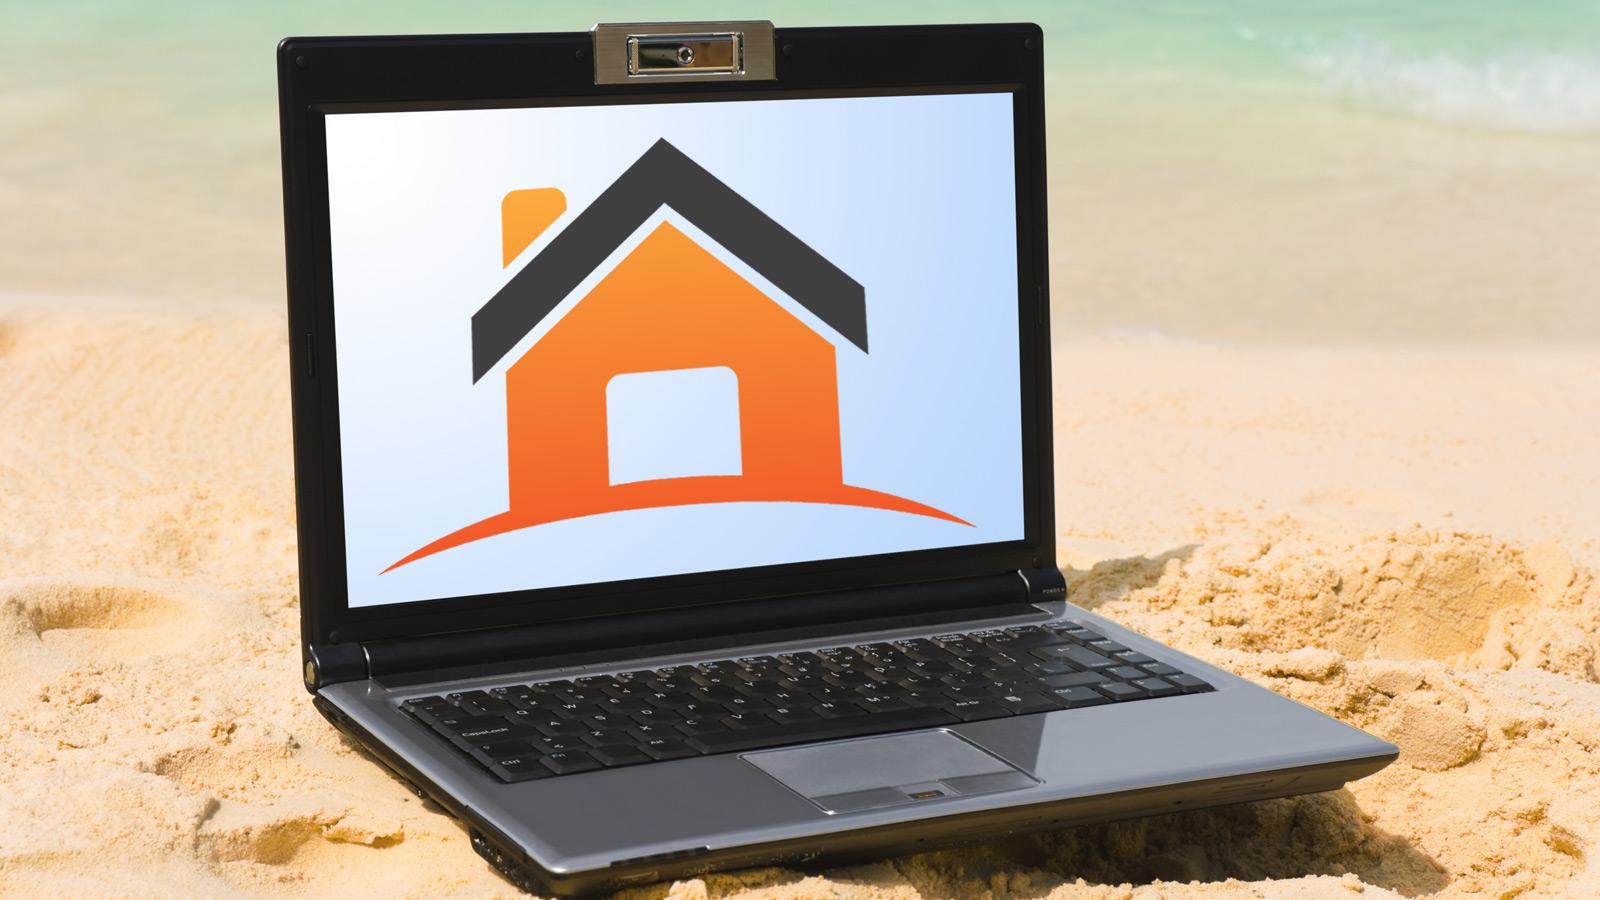 Testámos as populares plataformas de arrendamento de casas Airbnb, HouseTrip, HomeAway, Iha e Rentalia.